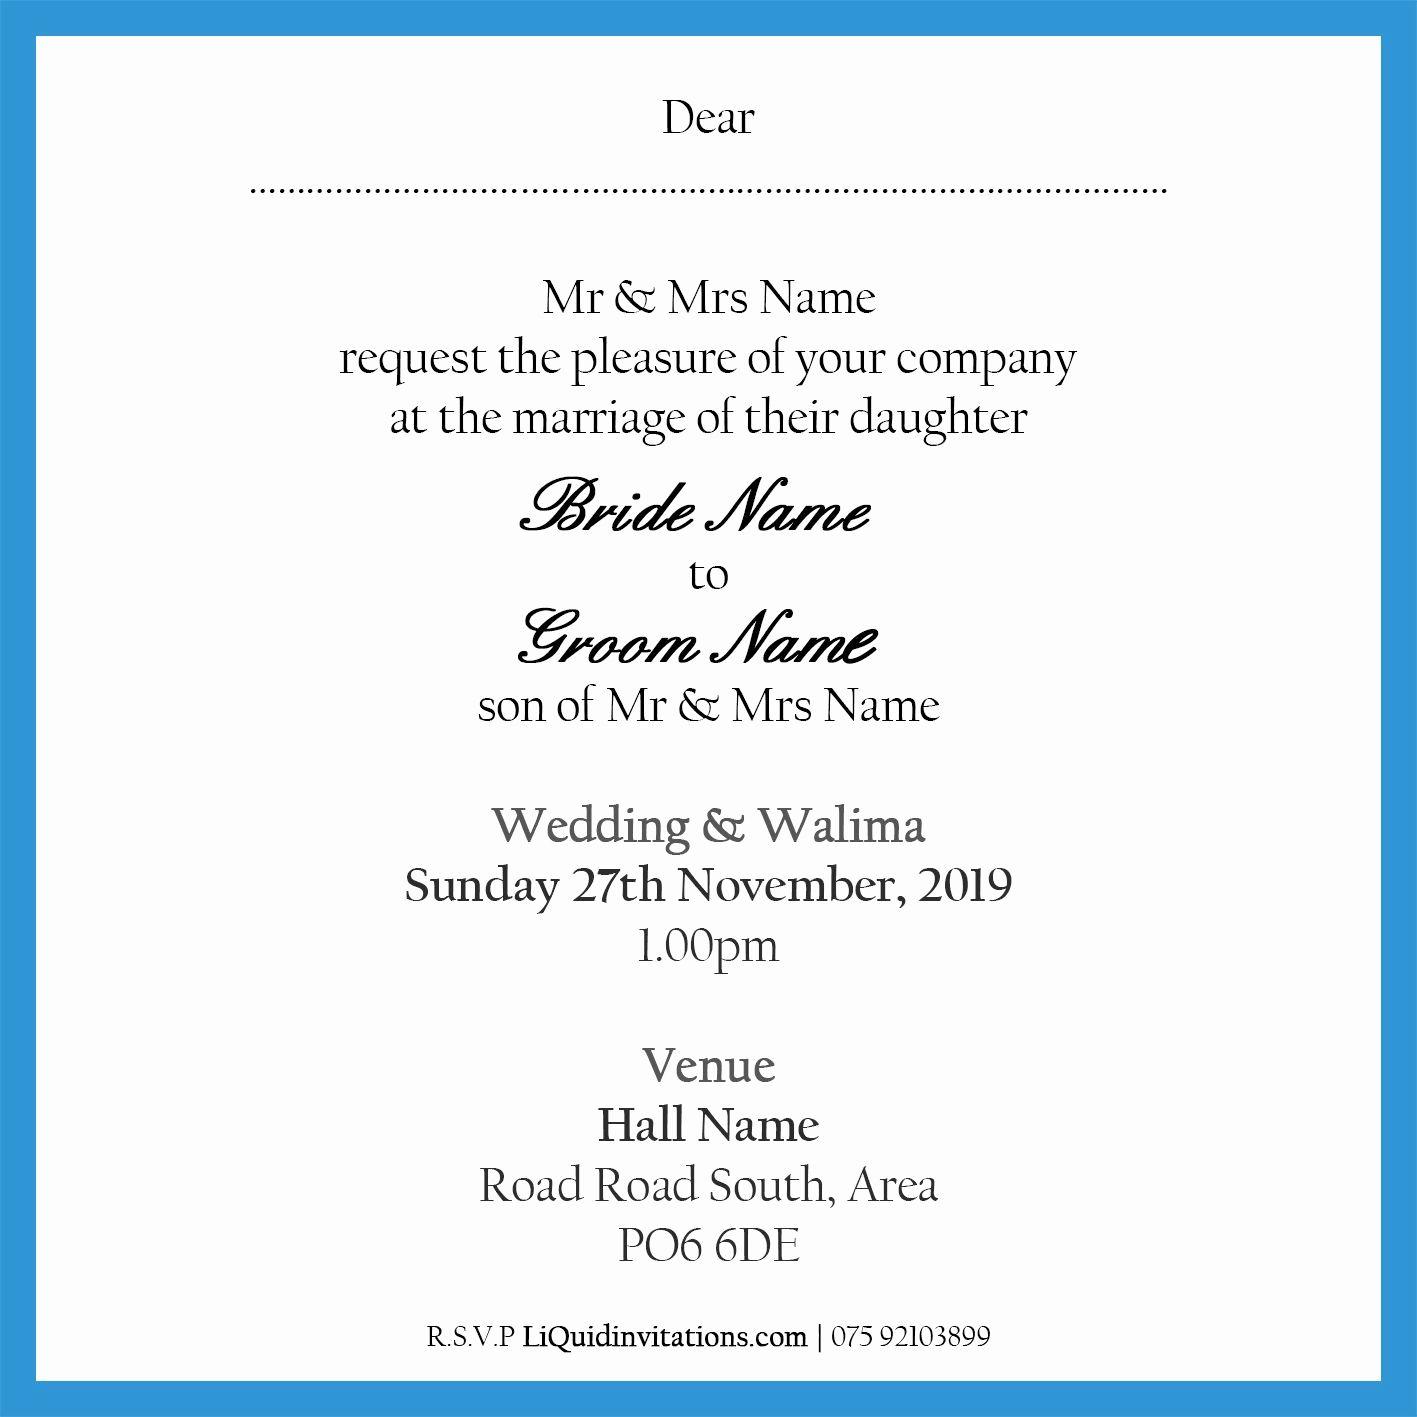 Walima Invitation Cards Wordings Best Of Muslim Wedding Invitation Wordings Muslim Wedding Cards Wedding Invitation Card Wording Muslim Wedding Invitations